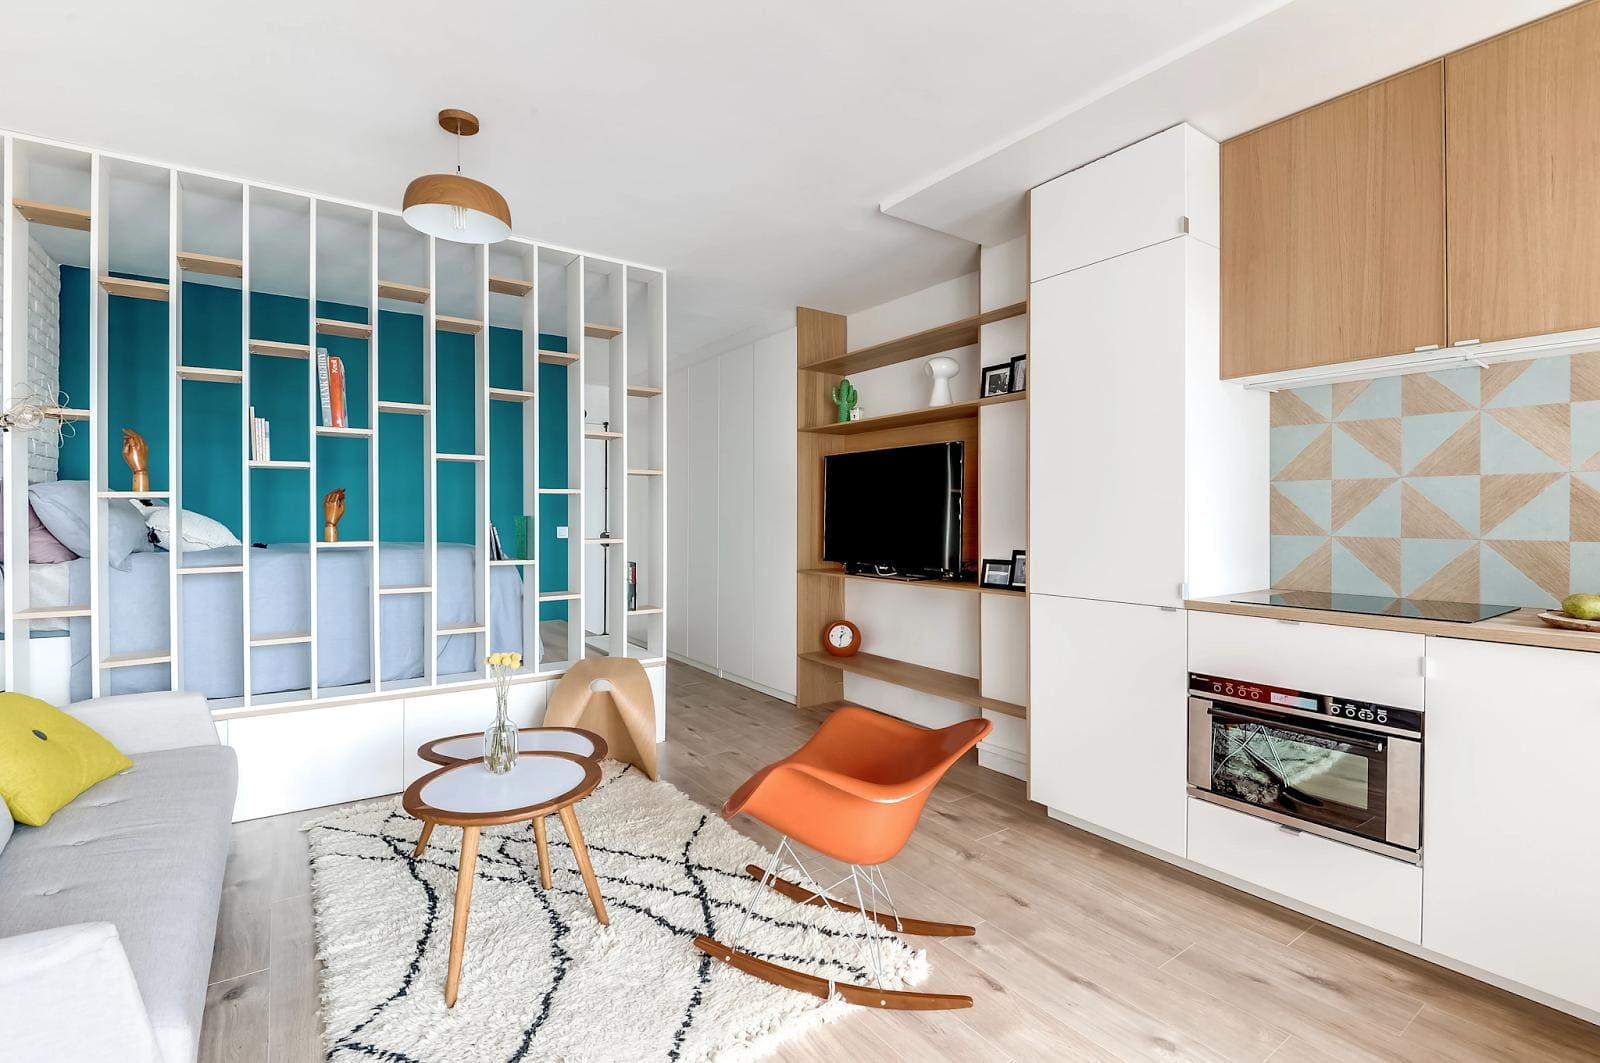 прозрачная перегородка в кухне-спальне